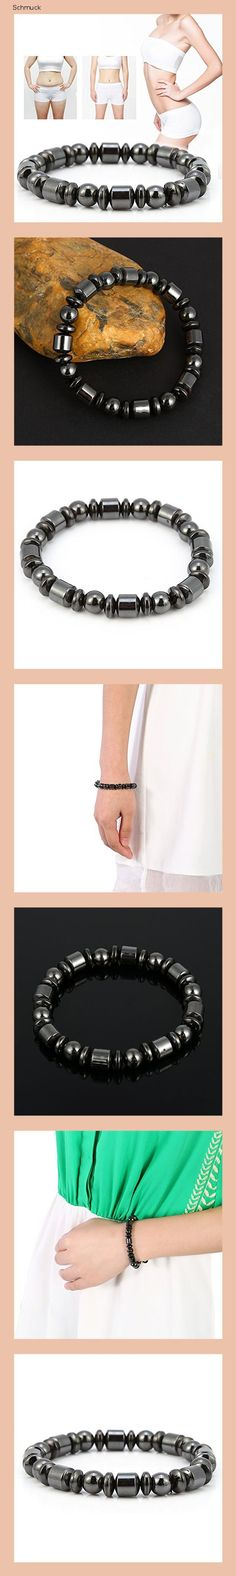 Magnetisches Gewichtsverlust Armband, Gesundheits Armband, Titan Stahl Armband stilvolles Abnehmen Armband Schmuck Schwarz Stein Armband Gesundheitswesen Magnetfeldtherapie Armband (1) - 14he